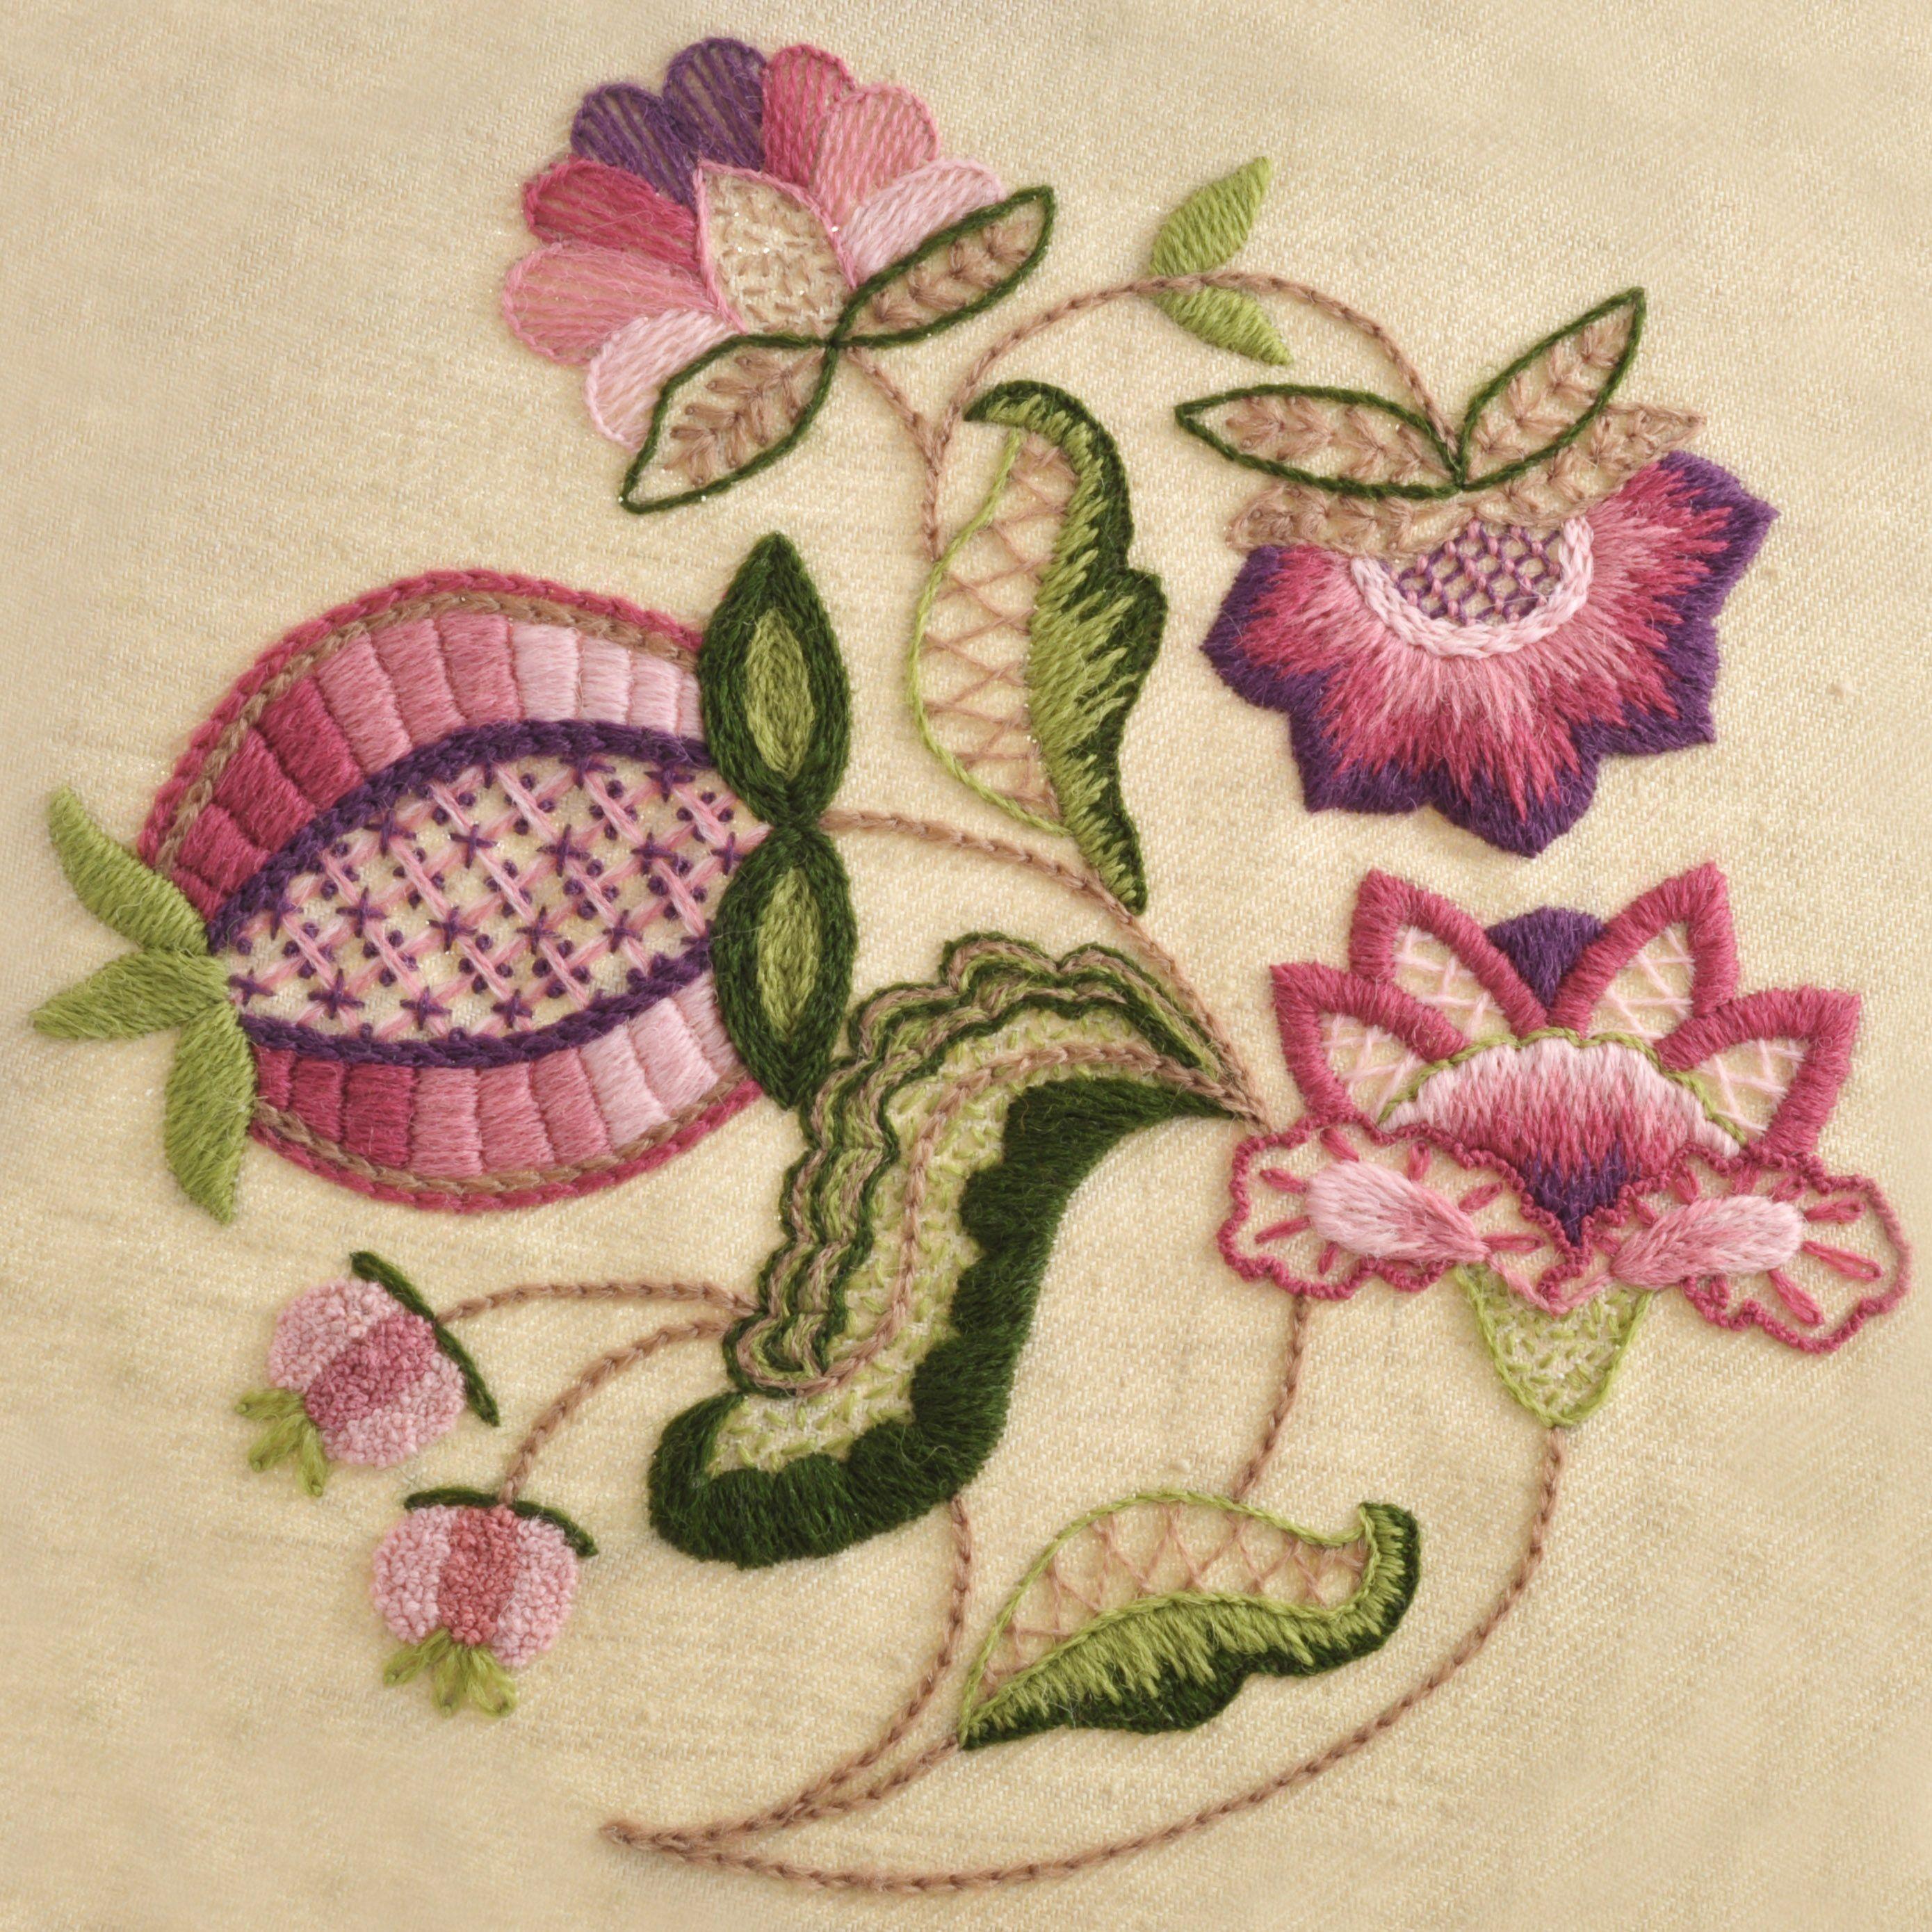 Crewel work pomegranate needlecrafts pinterest embroidery